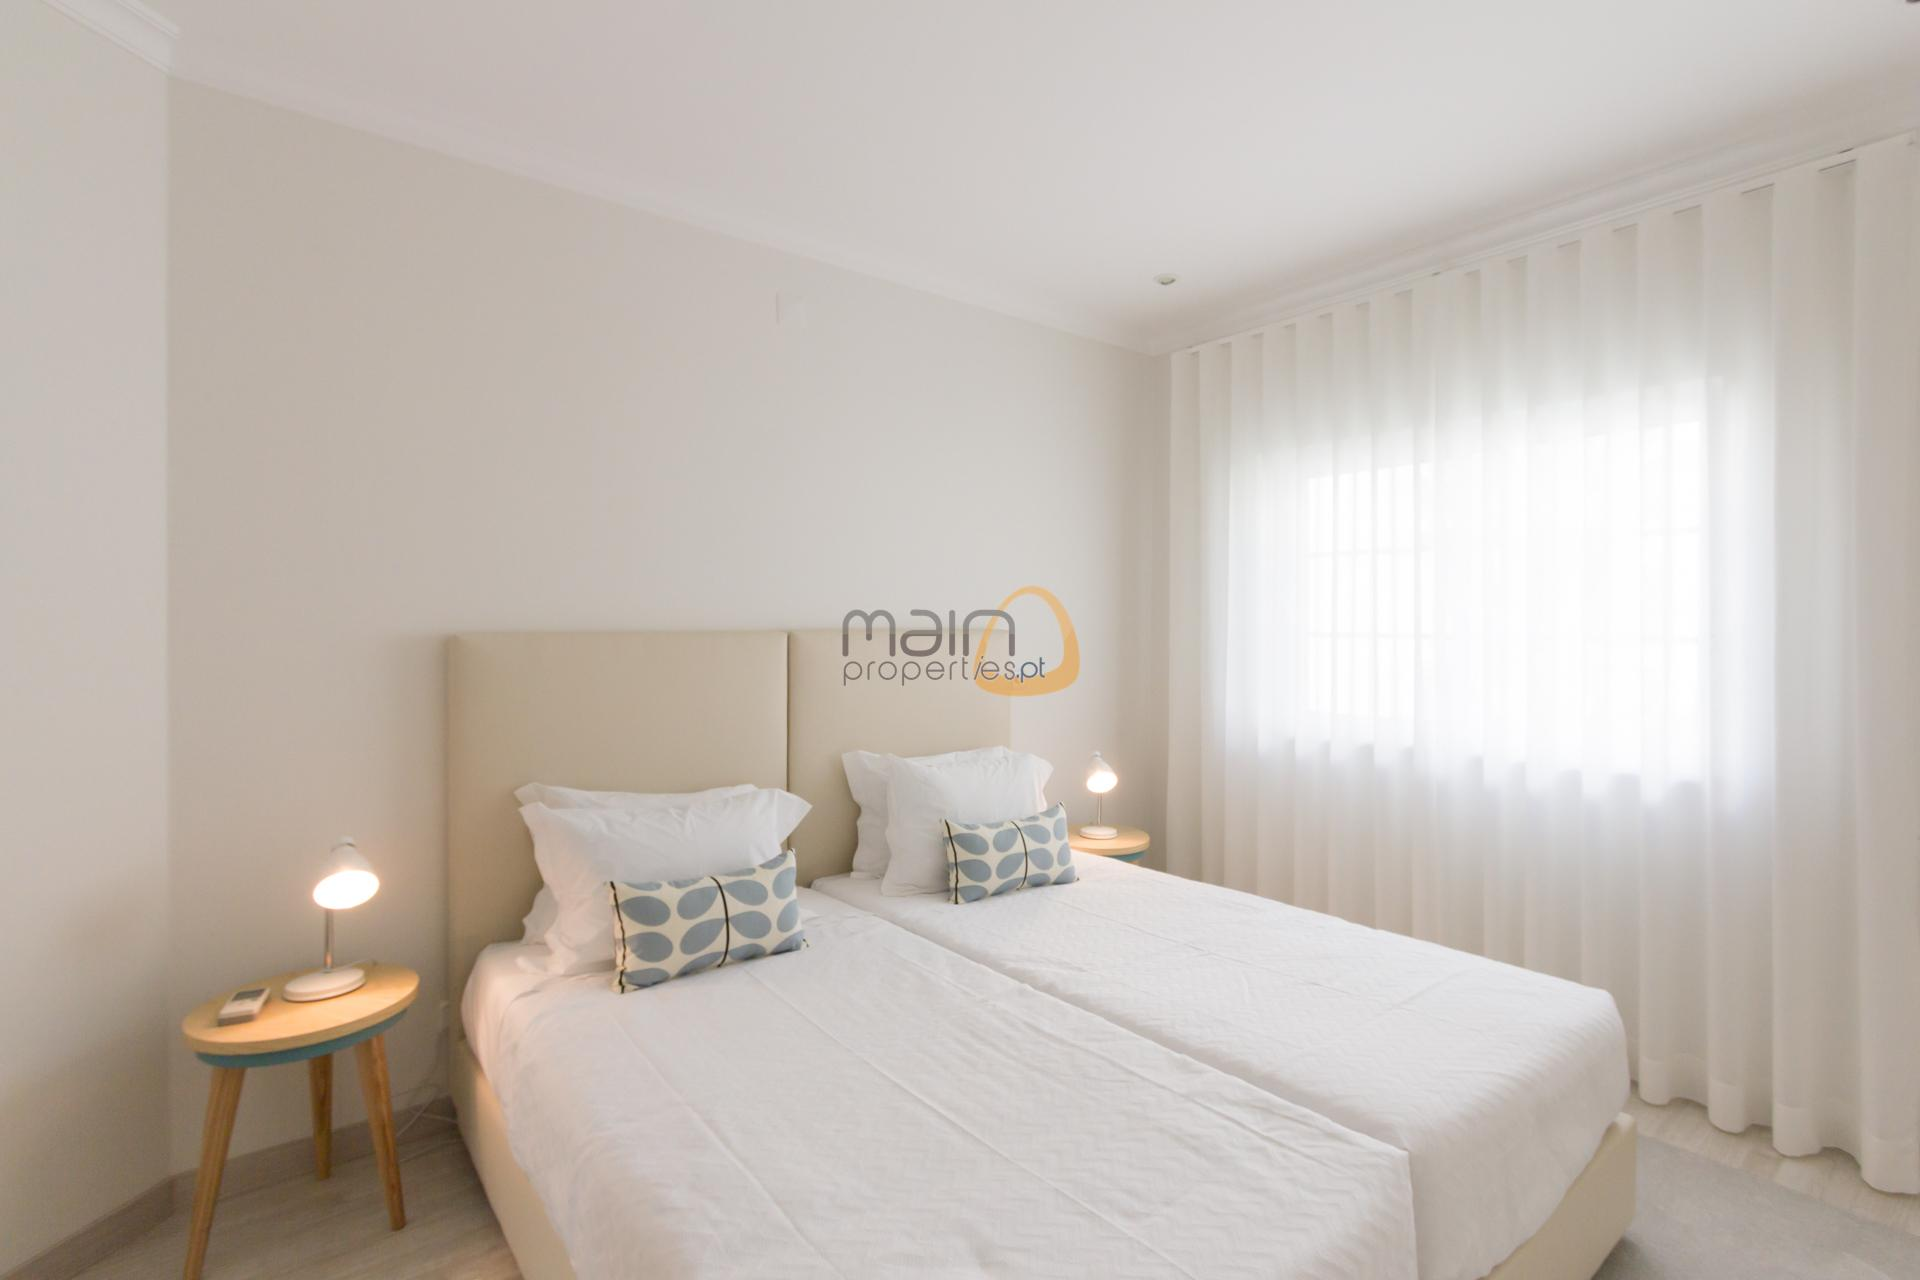 apartment-in-vale-do-lobo-algarve-golden-triangle-portugal-property-real-estate-mainproperties-mp134vdl-6